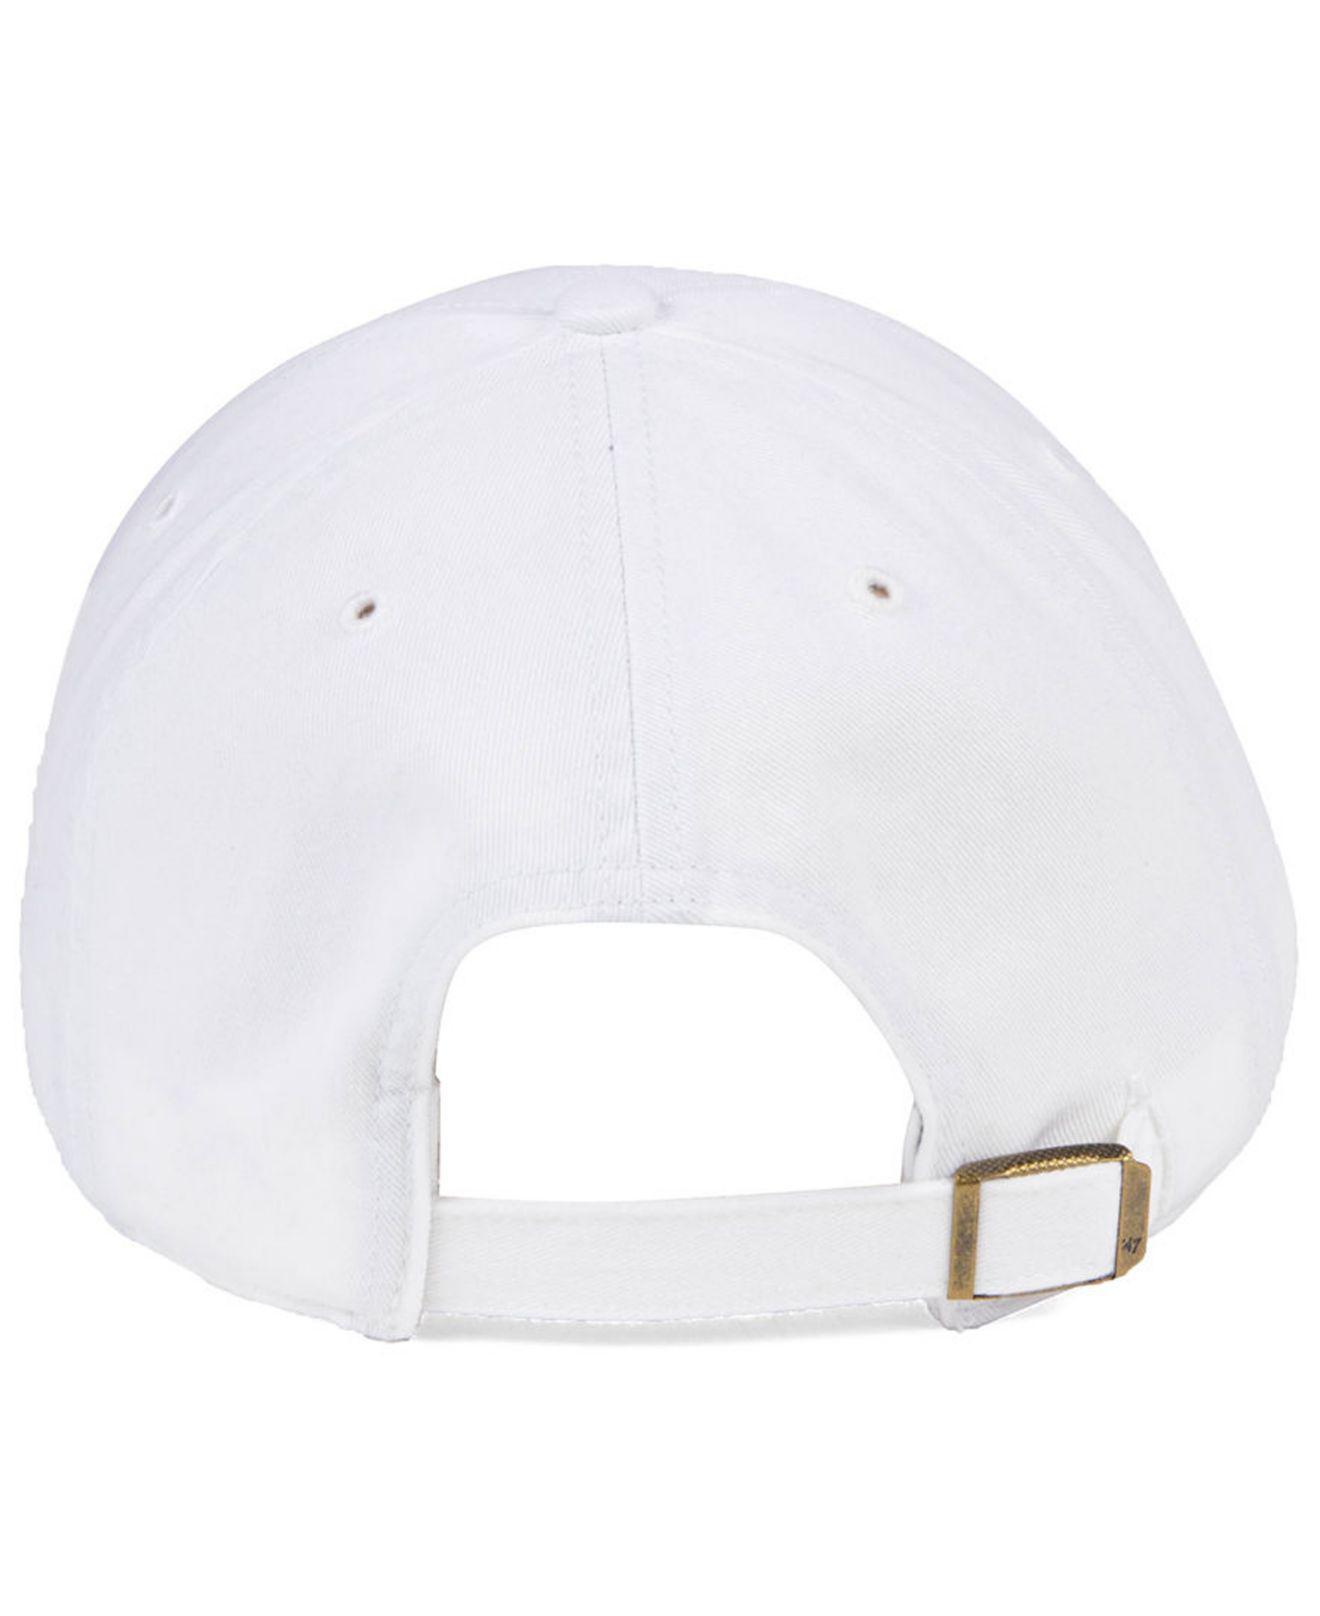 c96fe1fd7b13b Lyst - 47 Brand Pittsburgh Pirates White white Clean Up Cap in White ...